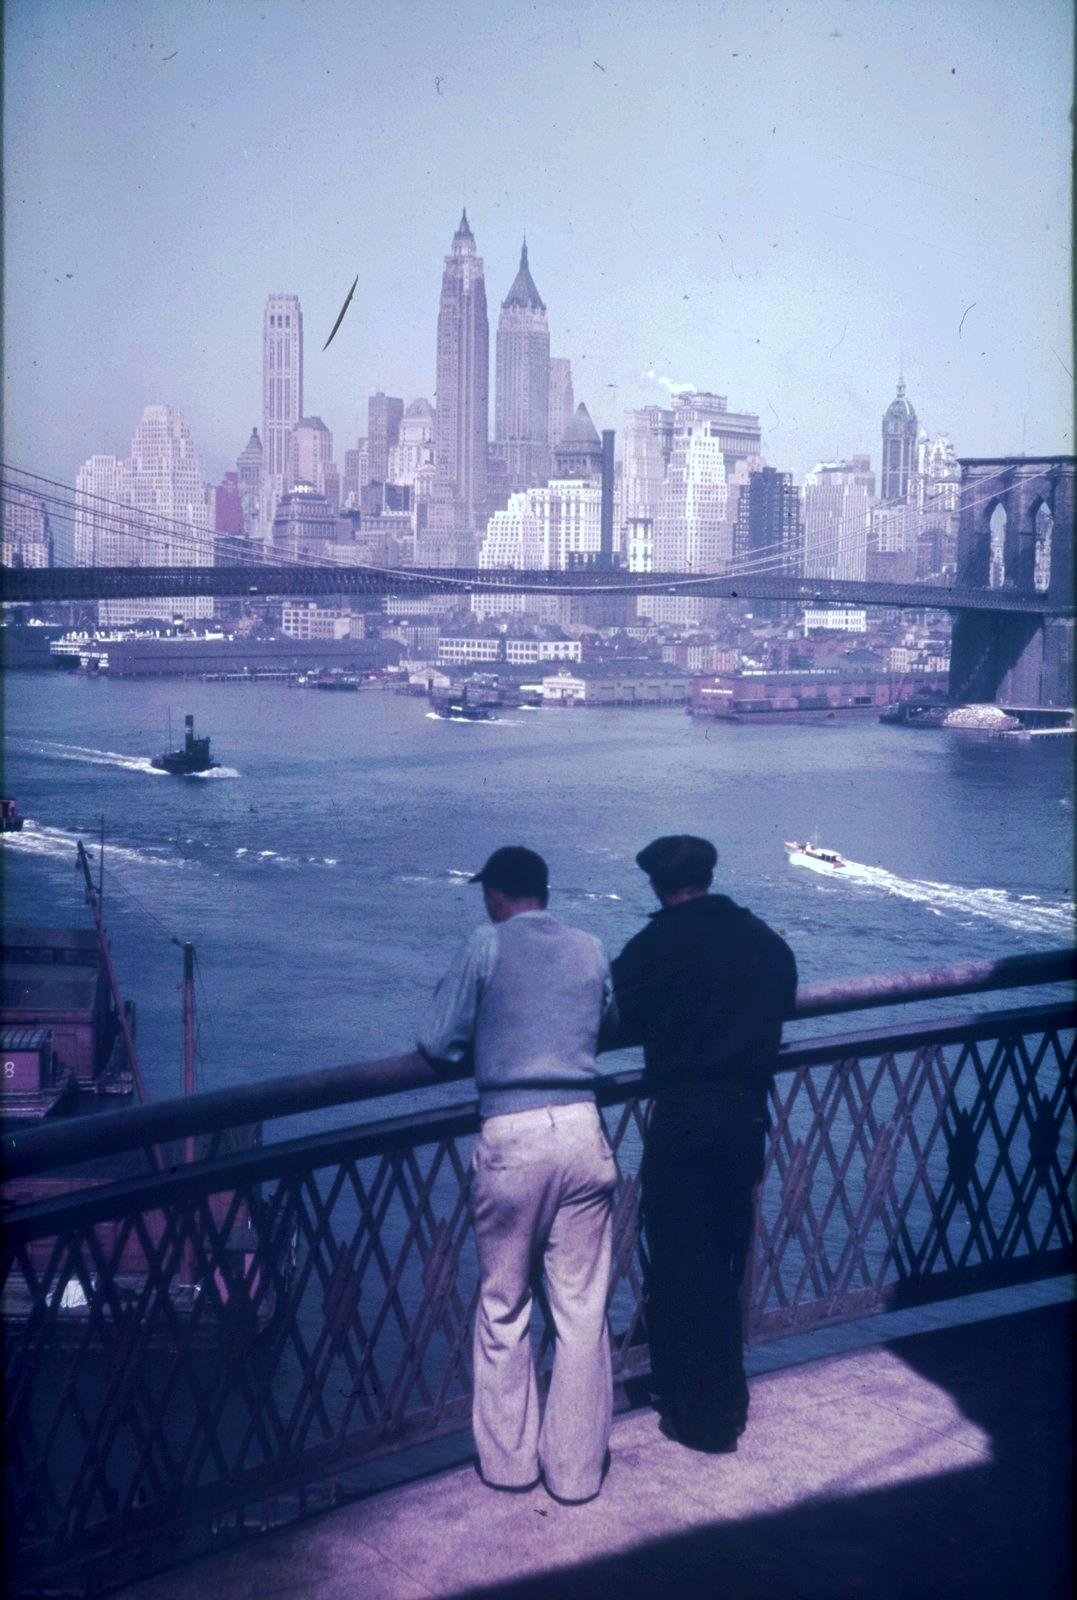 Нью-Йорк. Вид с моста через Ист-Ривер на Бруклинский мост